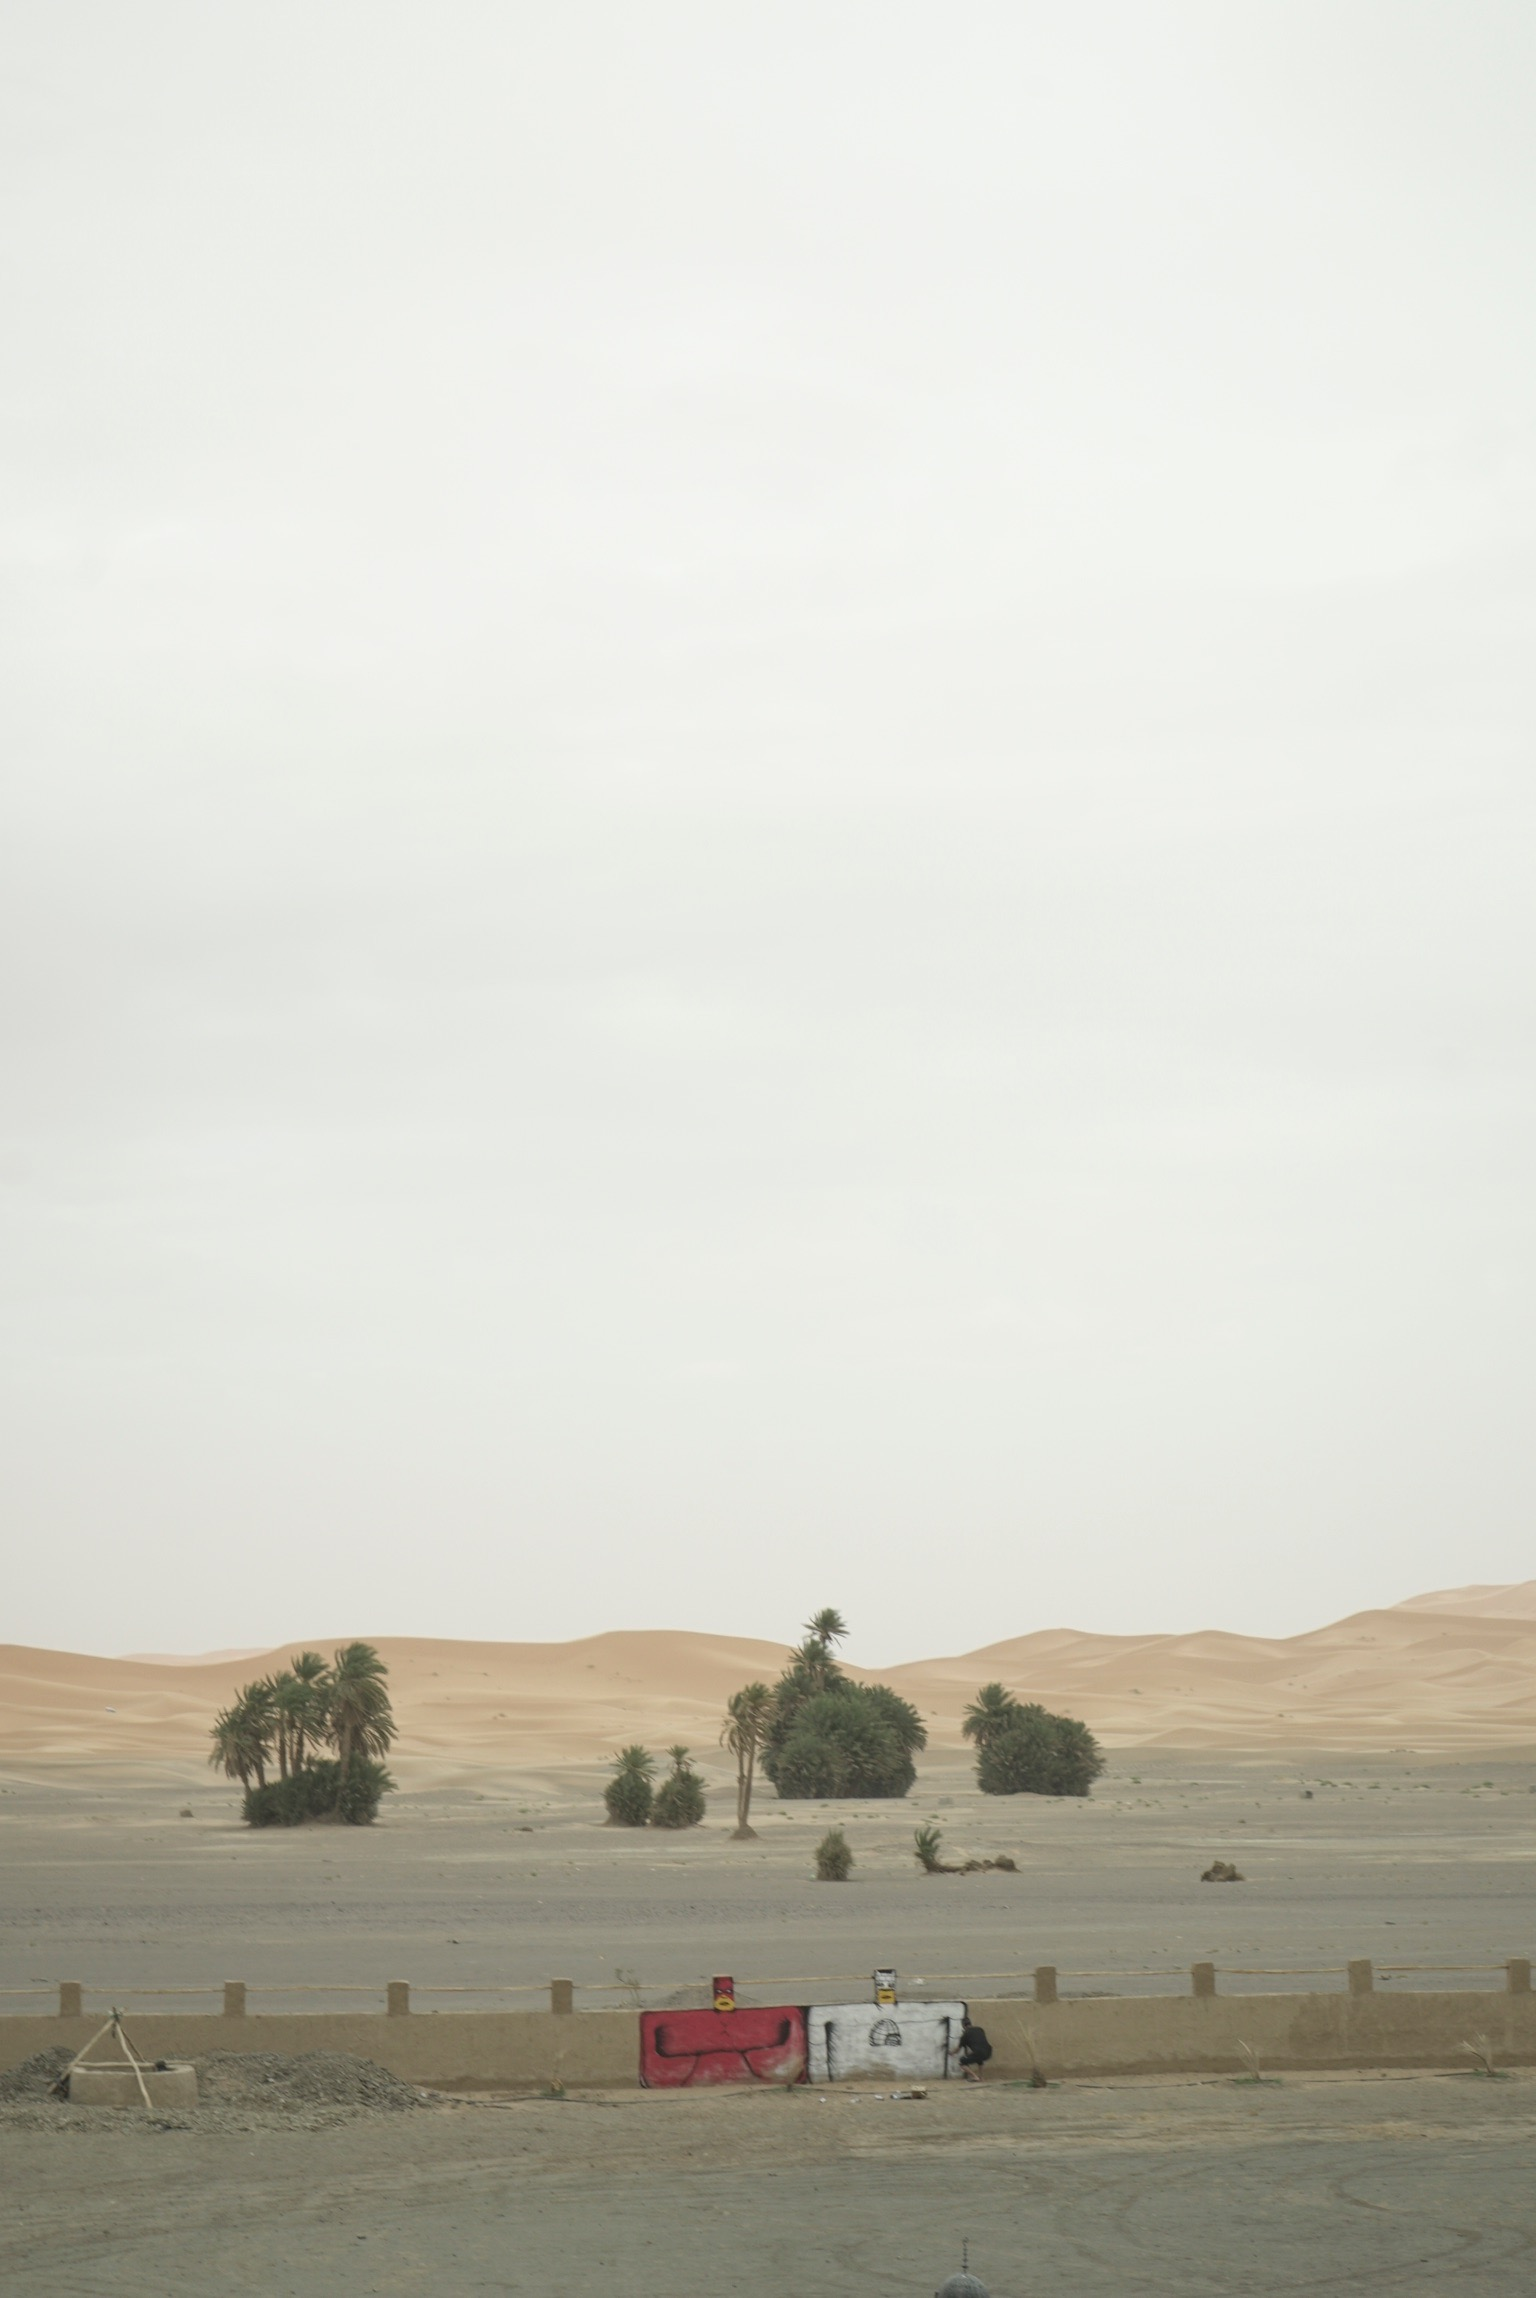 Choe walls - Sahara Desert - Morocco - Igloo Hong Project